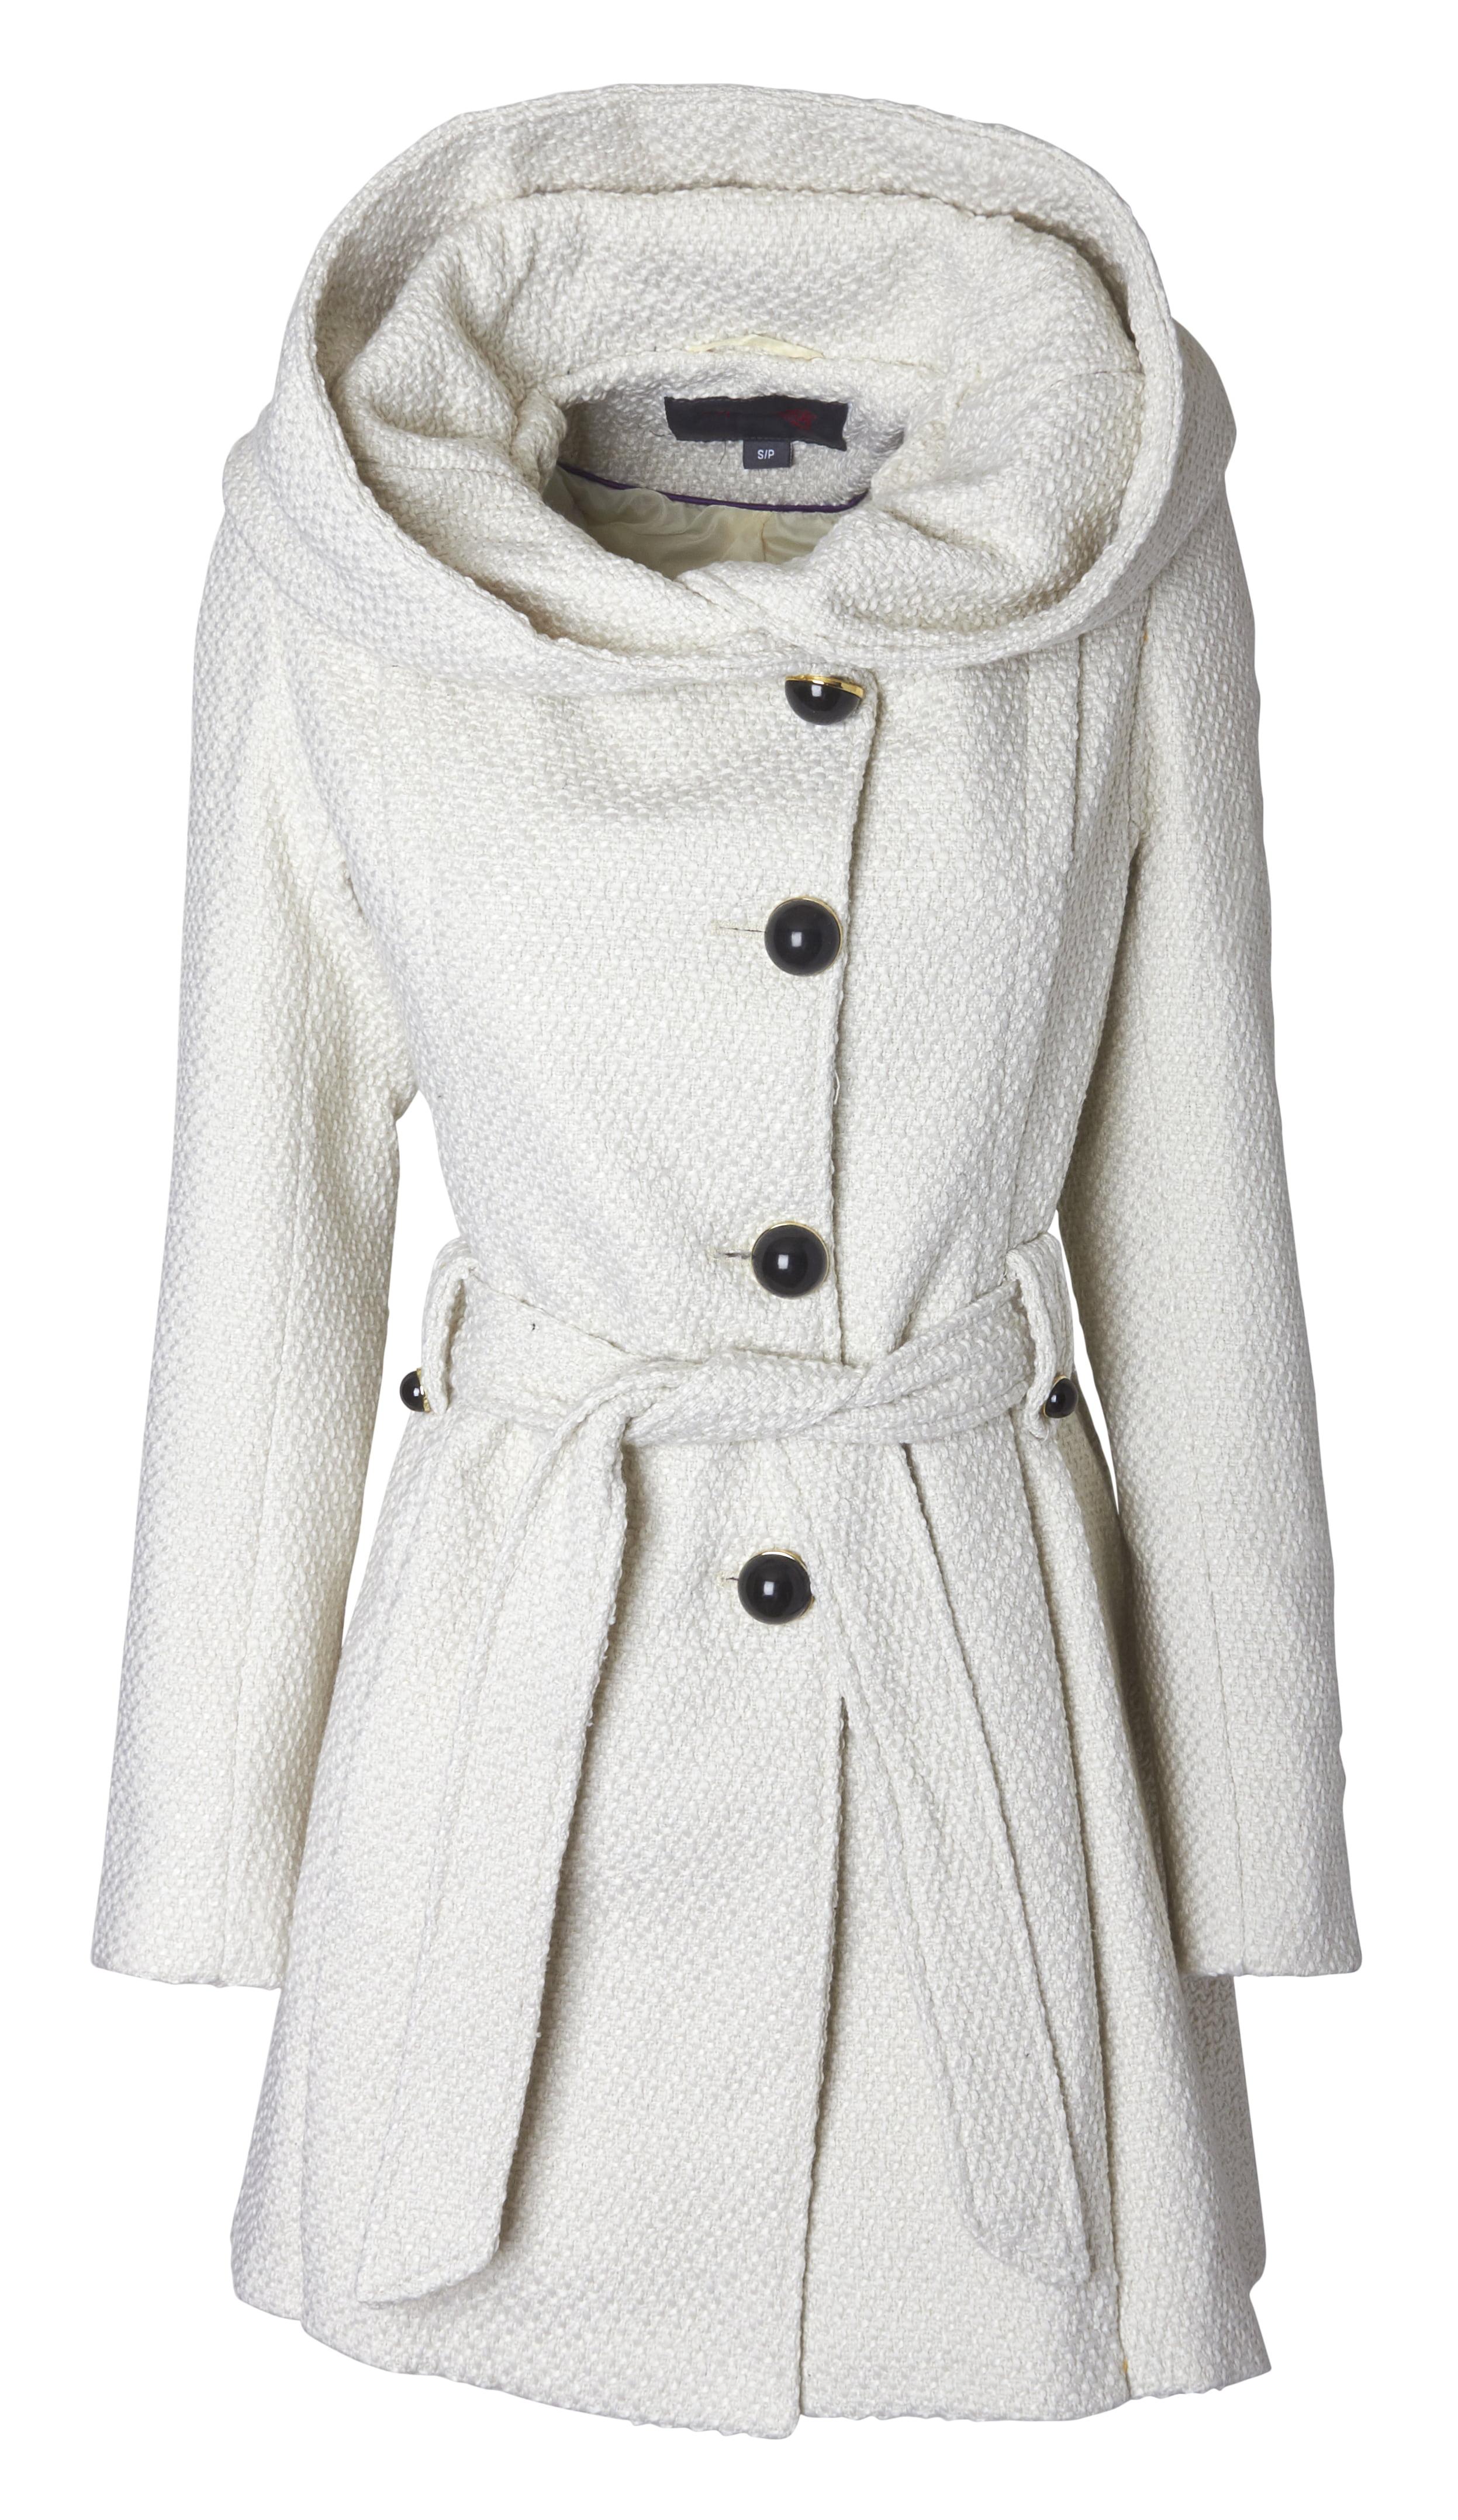 Sportoli Womens Single Breasted Wool Blend Belted Winter Dress Drama Coat with Hood by Sportoli